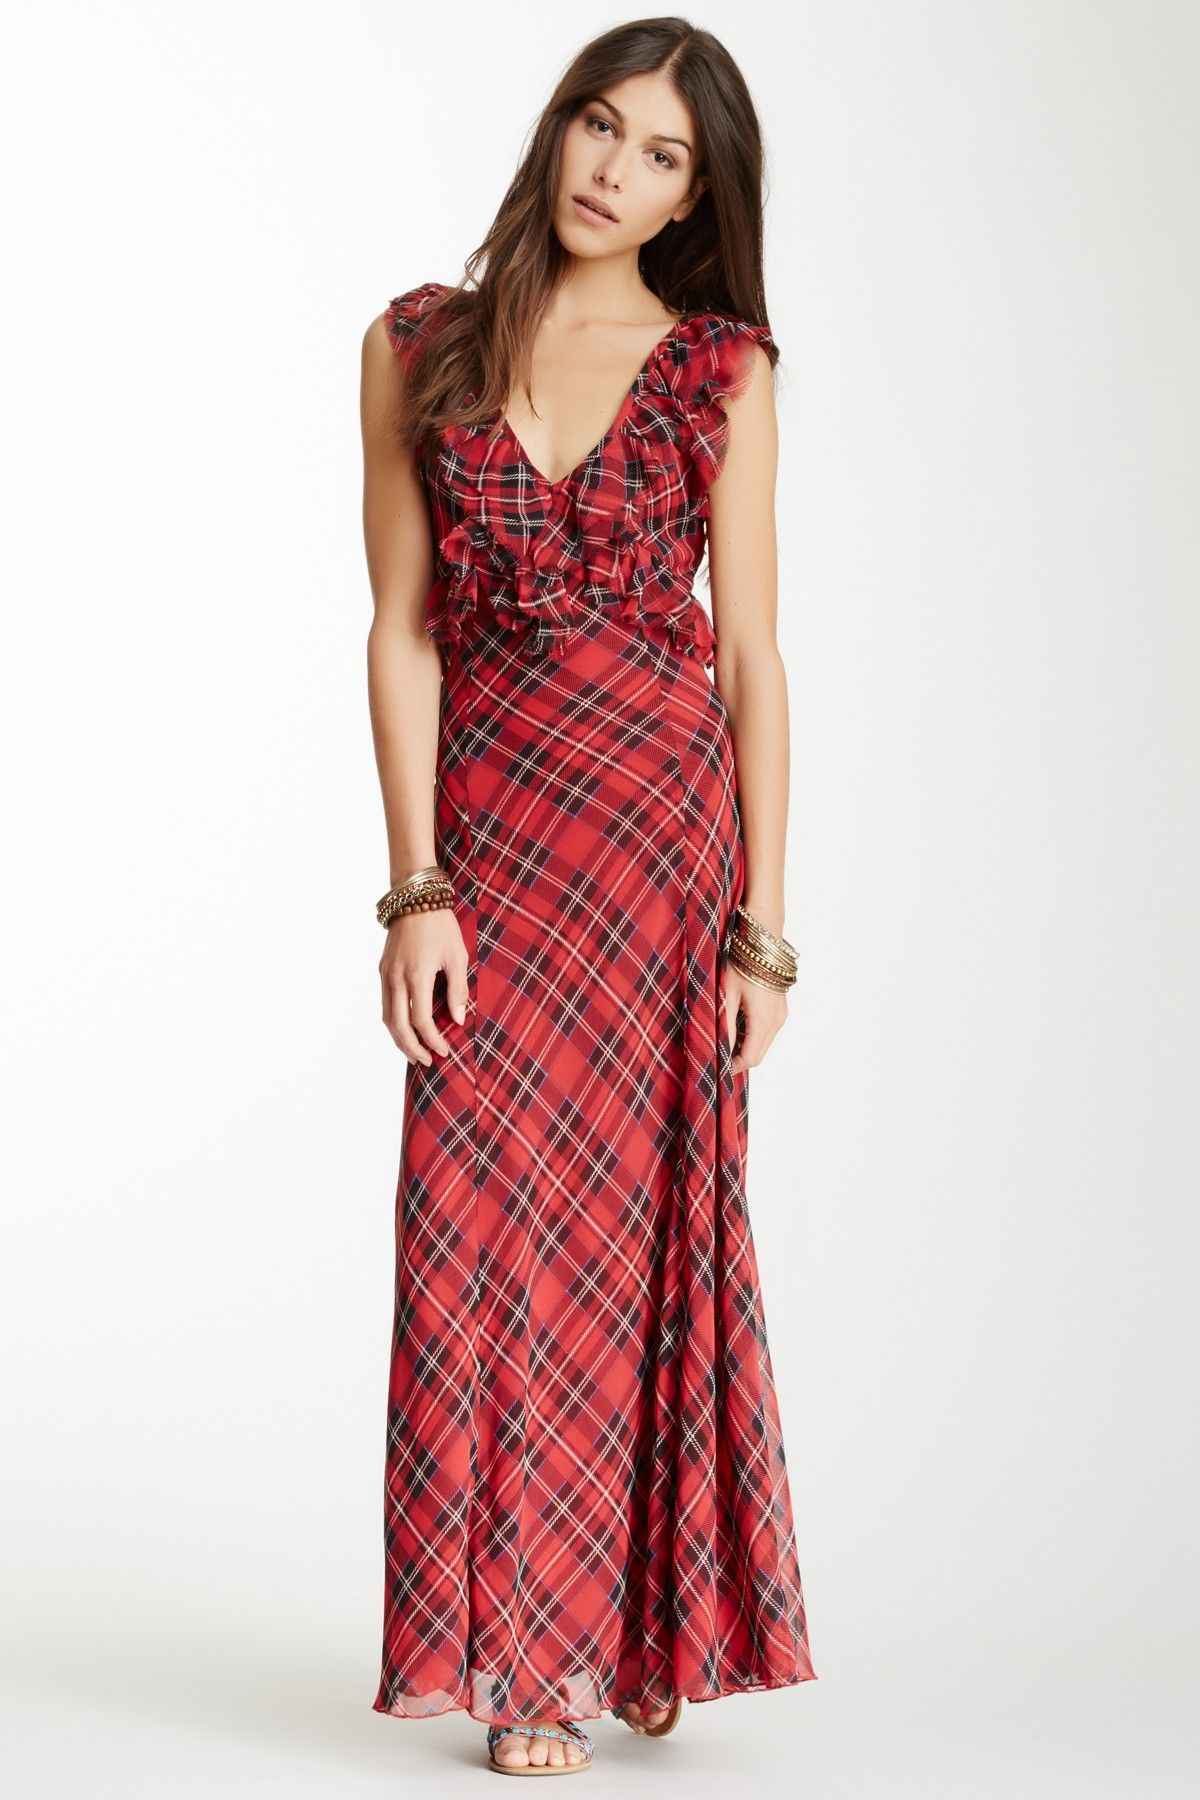 Venitia plaid ruffle maxi dress clothing and style pinterest